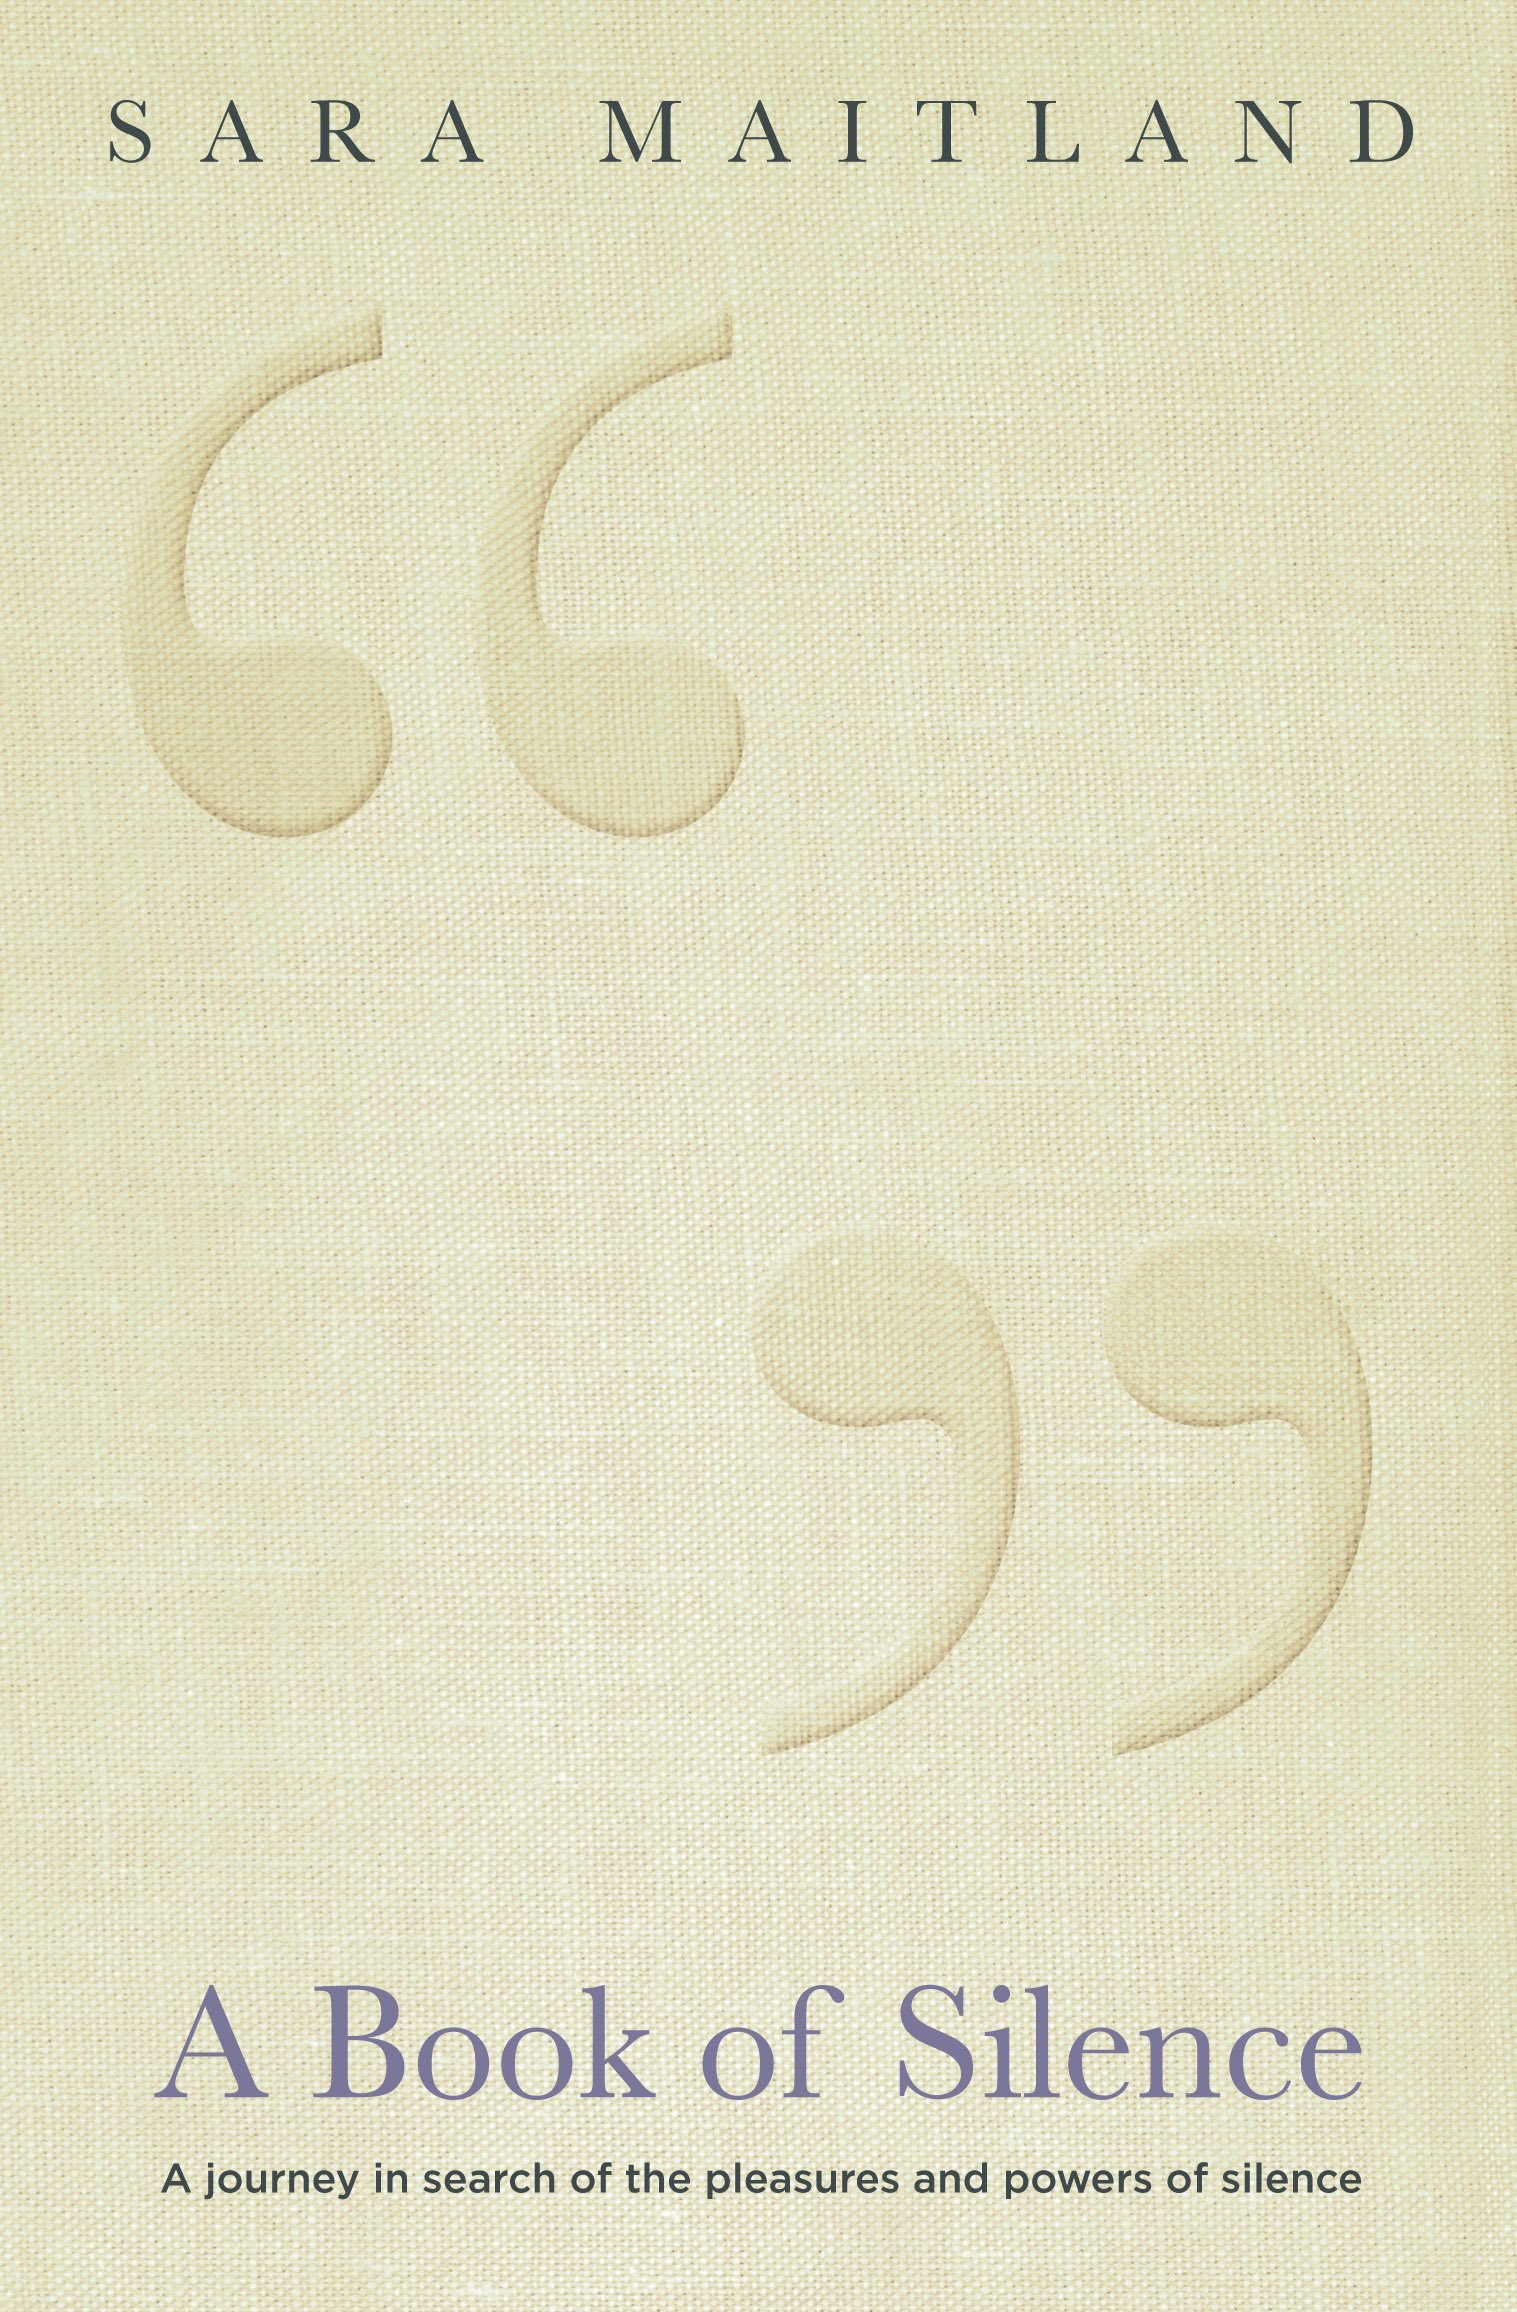 A Book of Silence: Amazon.de: Sara Maitland: Fremdsprachige Bücher